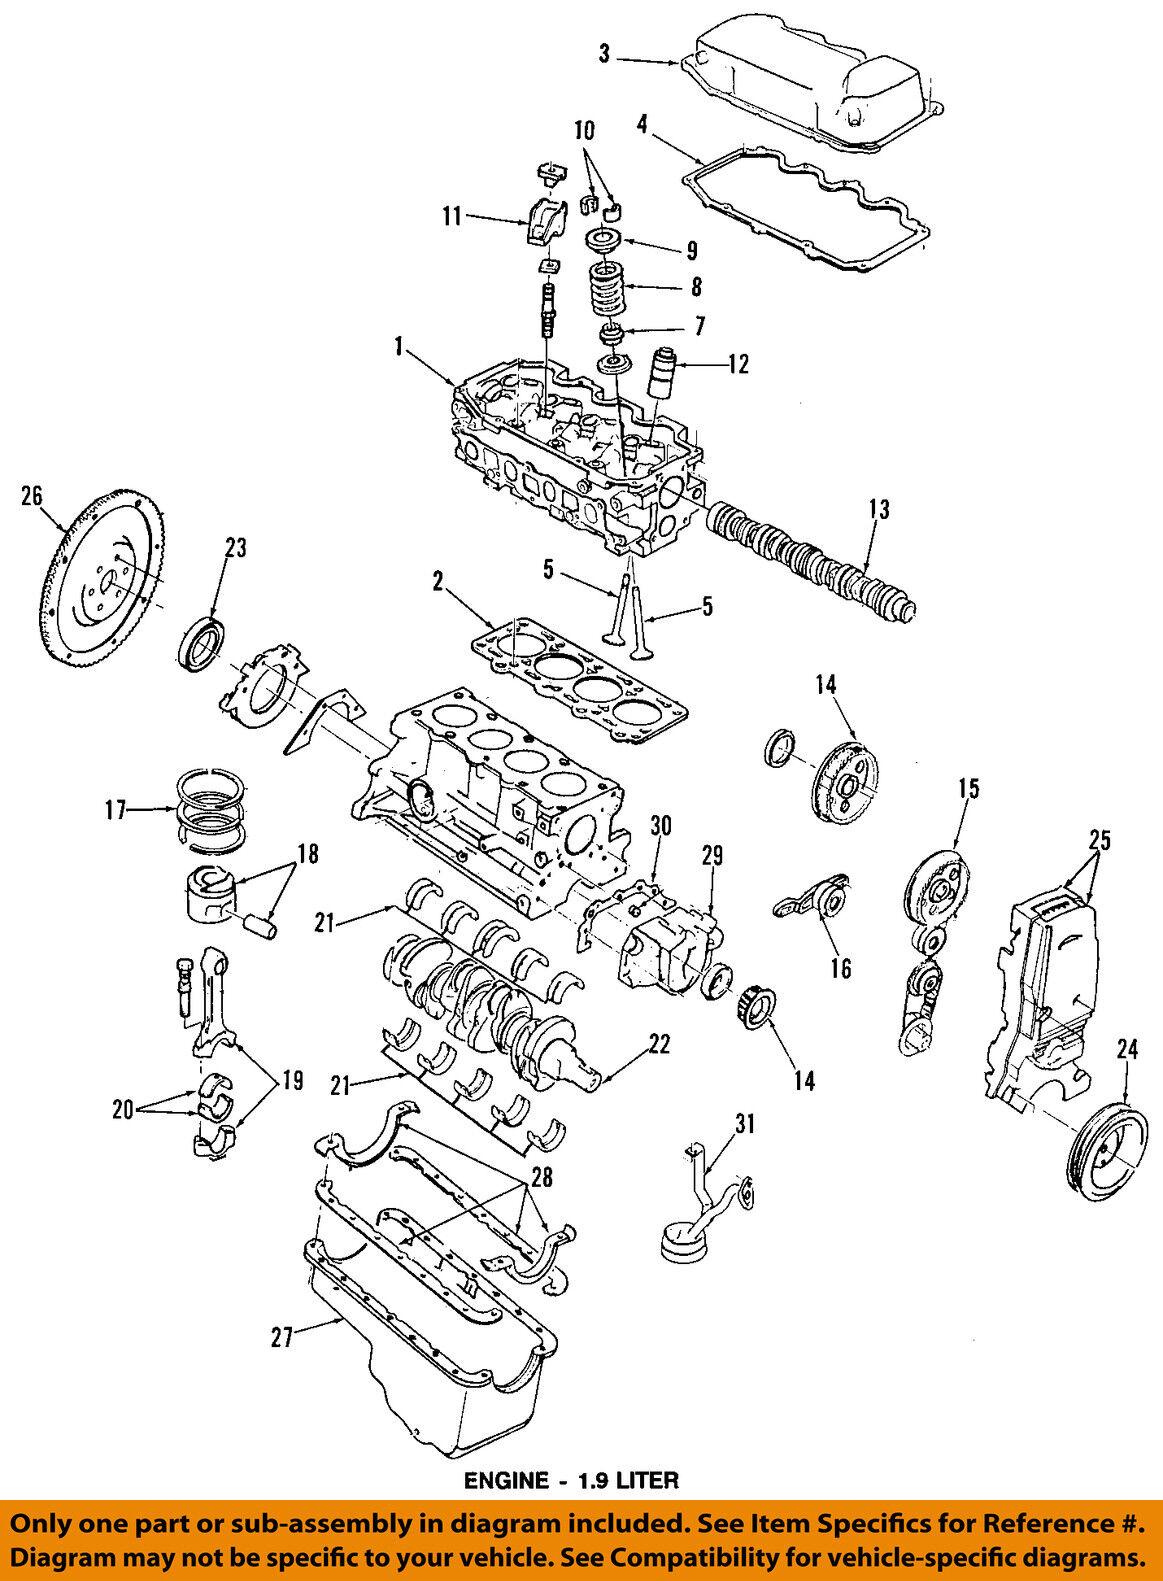 1 9 sefi engine diagram ford oem crankshaft crank gear f8cz6306aa for sale online ebay  ford oem crankshaft crank gear